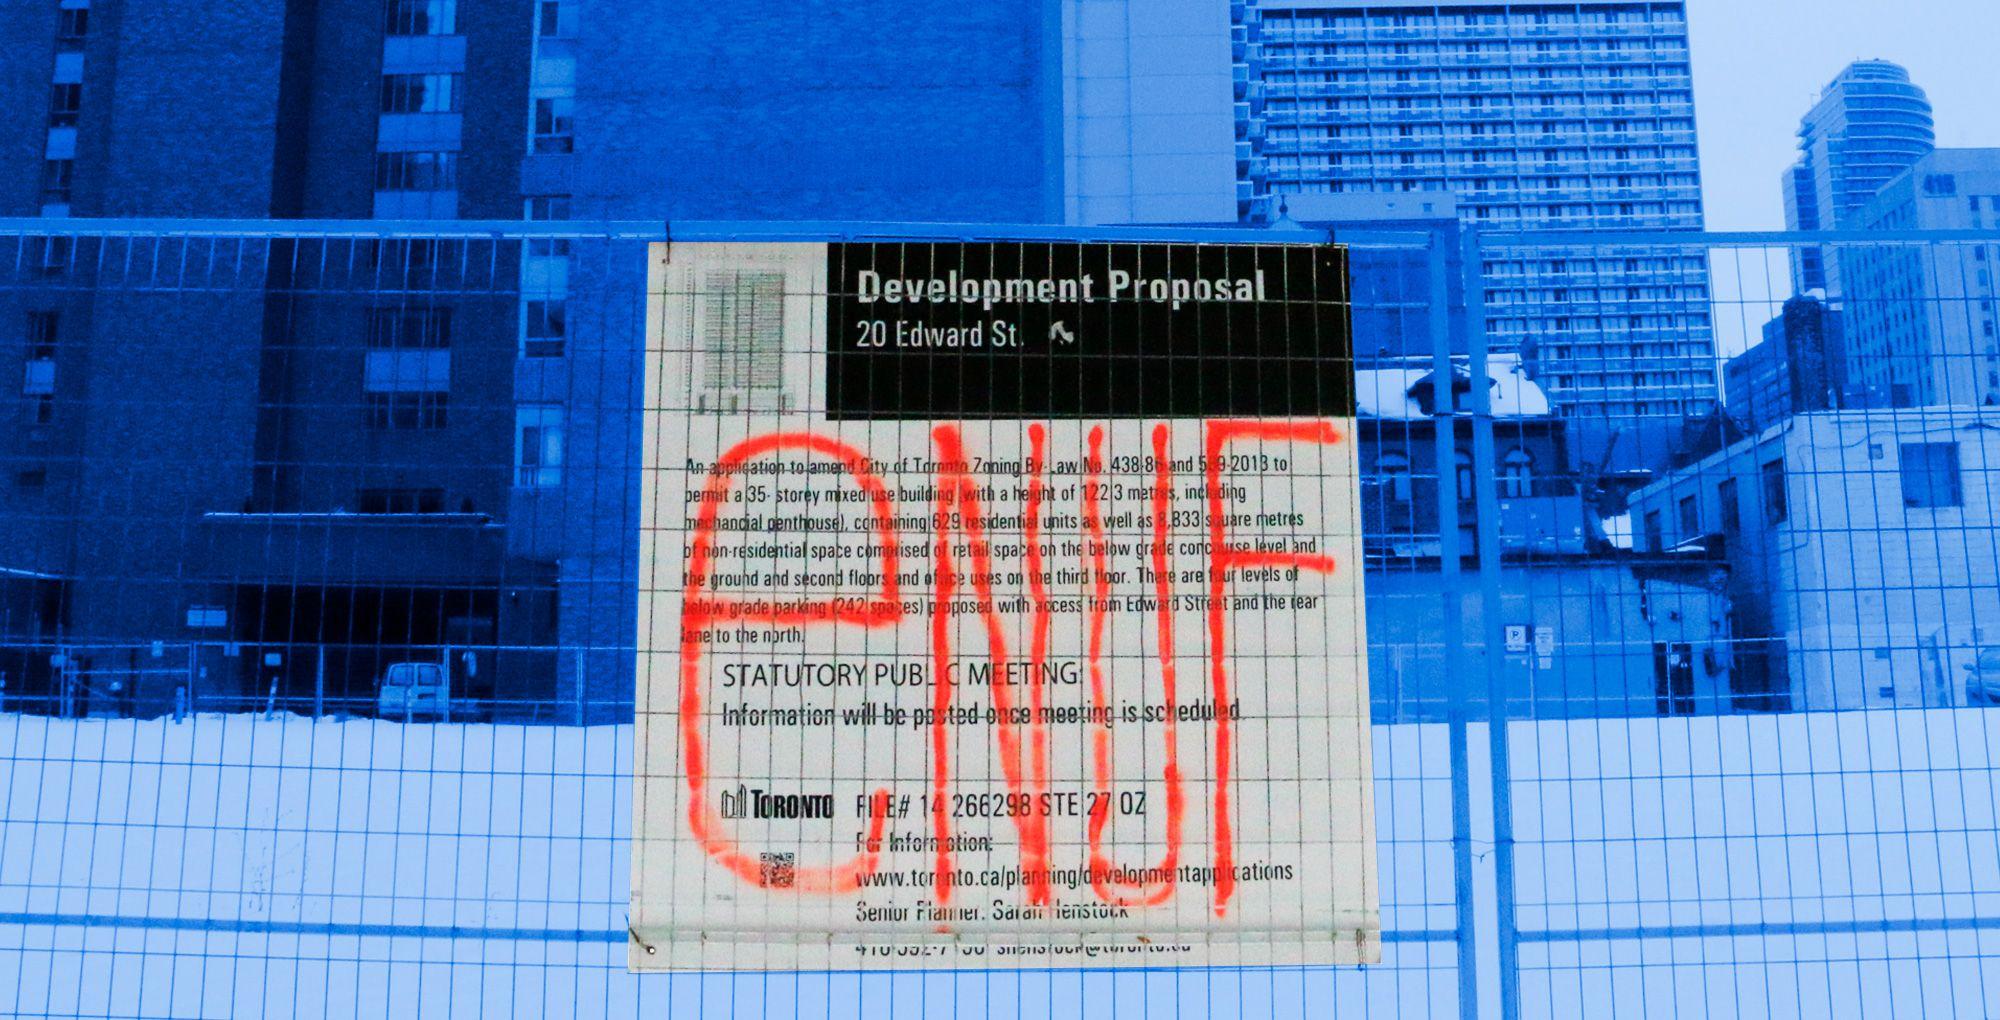 OMB Reform: Onward and upward | Toronto Star